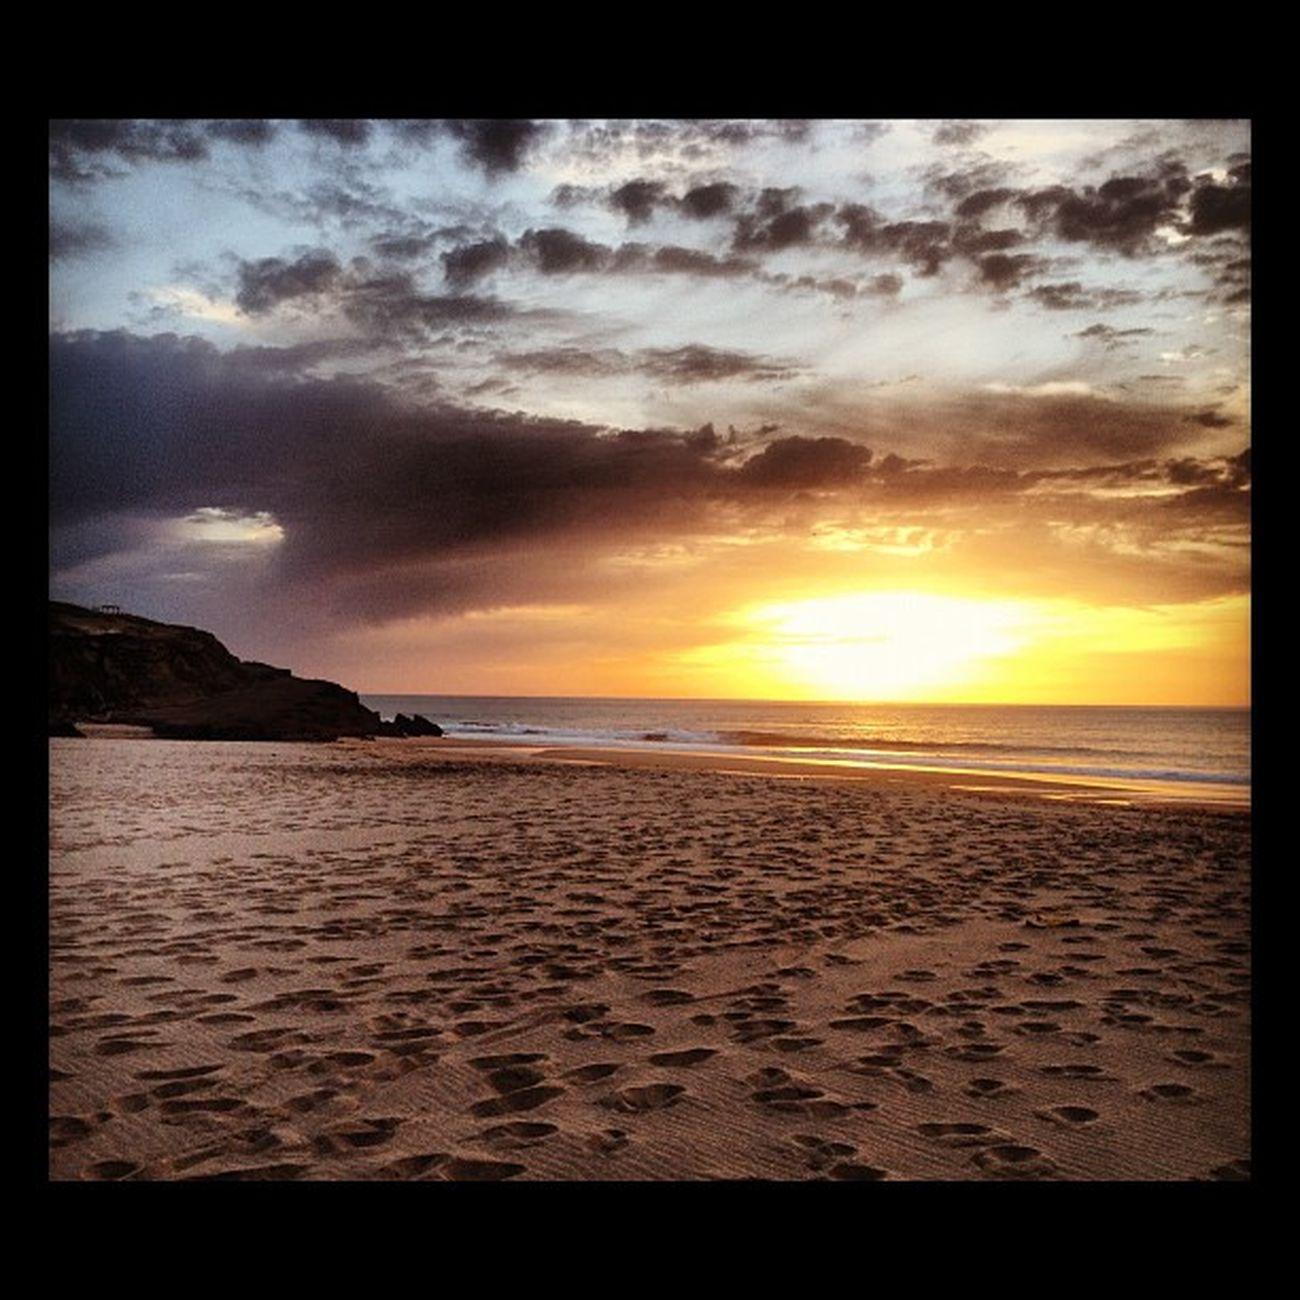 #sintra #praiadasmacas #beach #portugal #portugaligers #igersportugal #lisboa #igers #photography #photooftheday #pictureoftheday #ocean #water #sun #sunset #iphone5 #iphonesia #iphoneonly #iphonephotography #instagood #instagram #instalove #instamood #in Instagram IPhone5 Beach Instamood Water Igers Sun Instagramers Sunset Instagood Instagramhub Sintra Instadaily Photography Pictureoftheday Ocean Instalove Portugaligers Lisboa Igersportugal Portugal Iphoneonly Iphonephotography Photooftheday Iphonesia Praiadasmacas